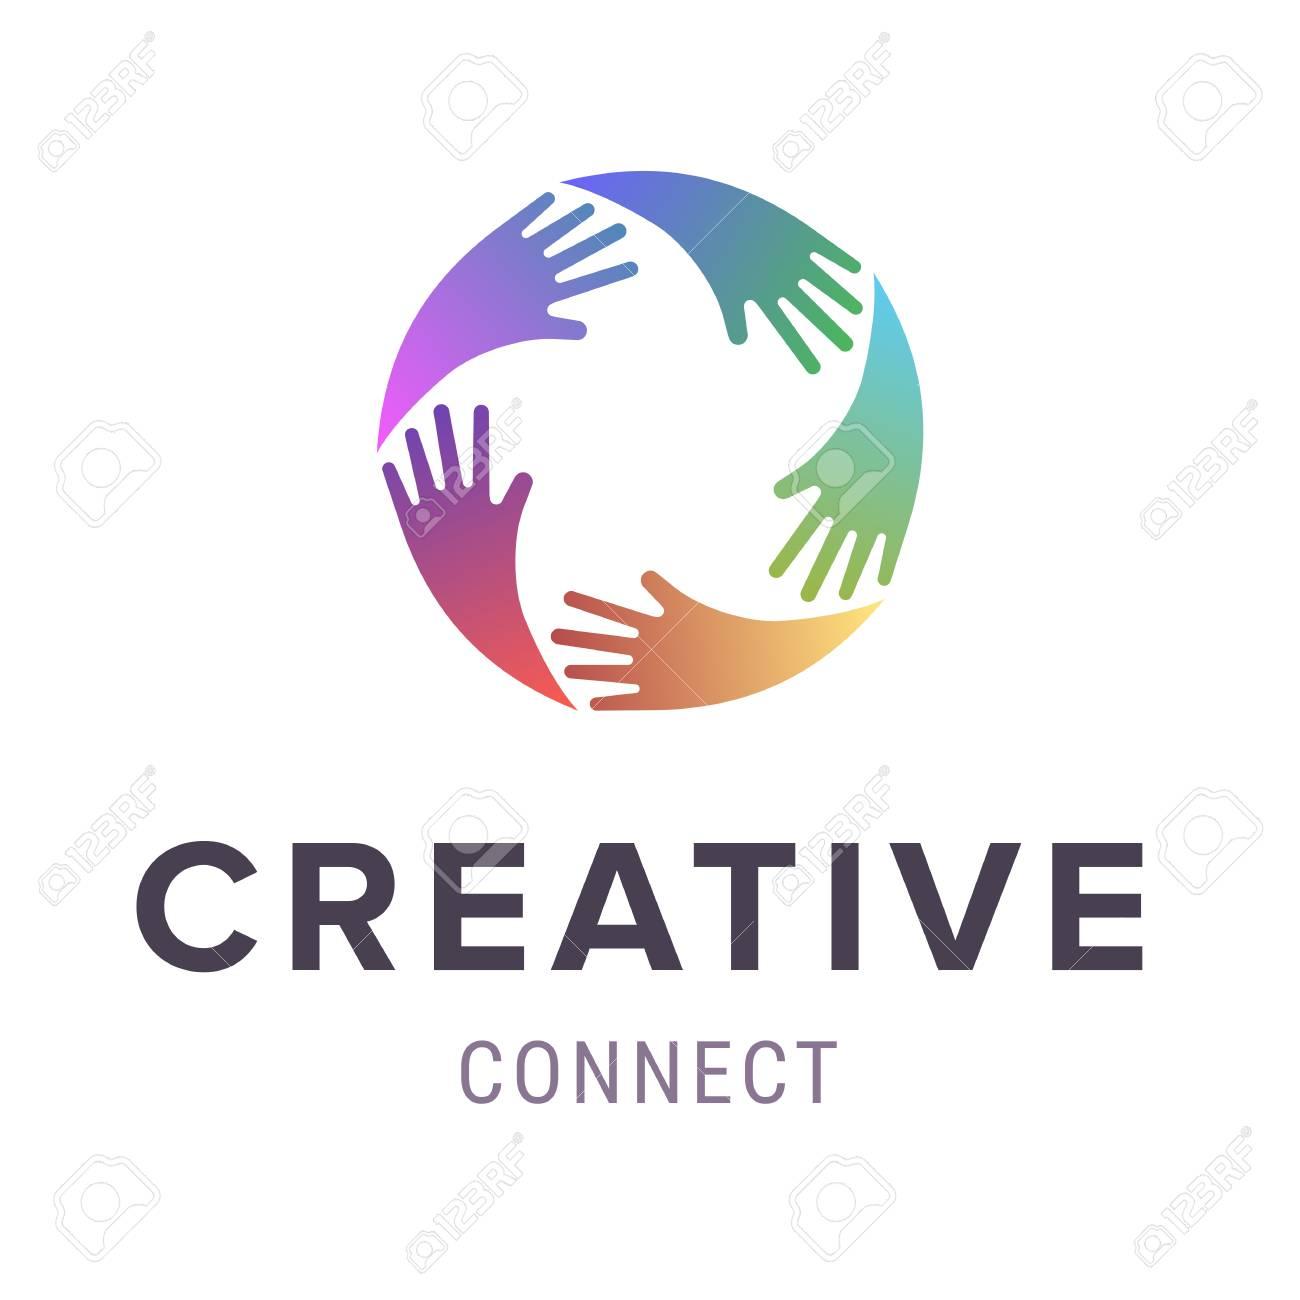 Hands logo. Abstract logo design. Vector concept or conceptual circle spiral of colorful hand symbols. - 85239565